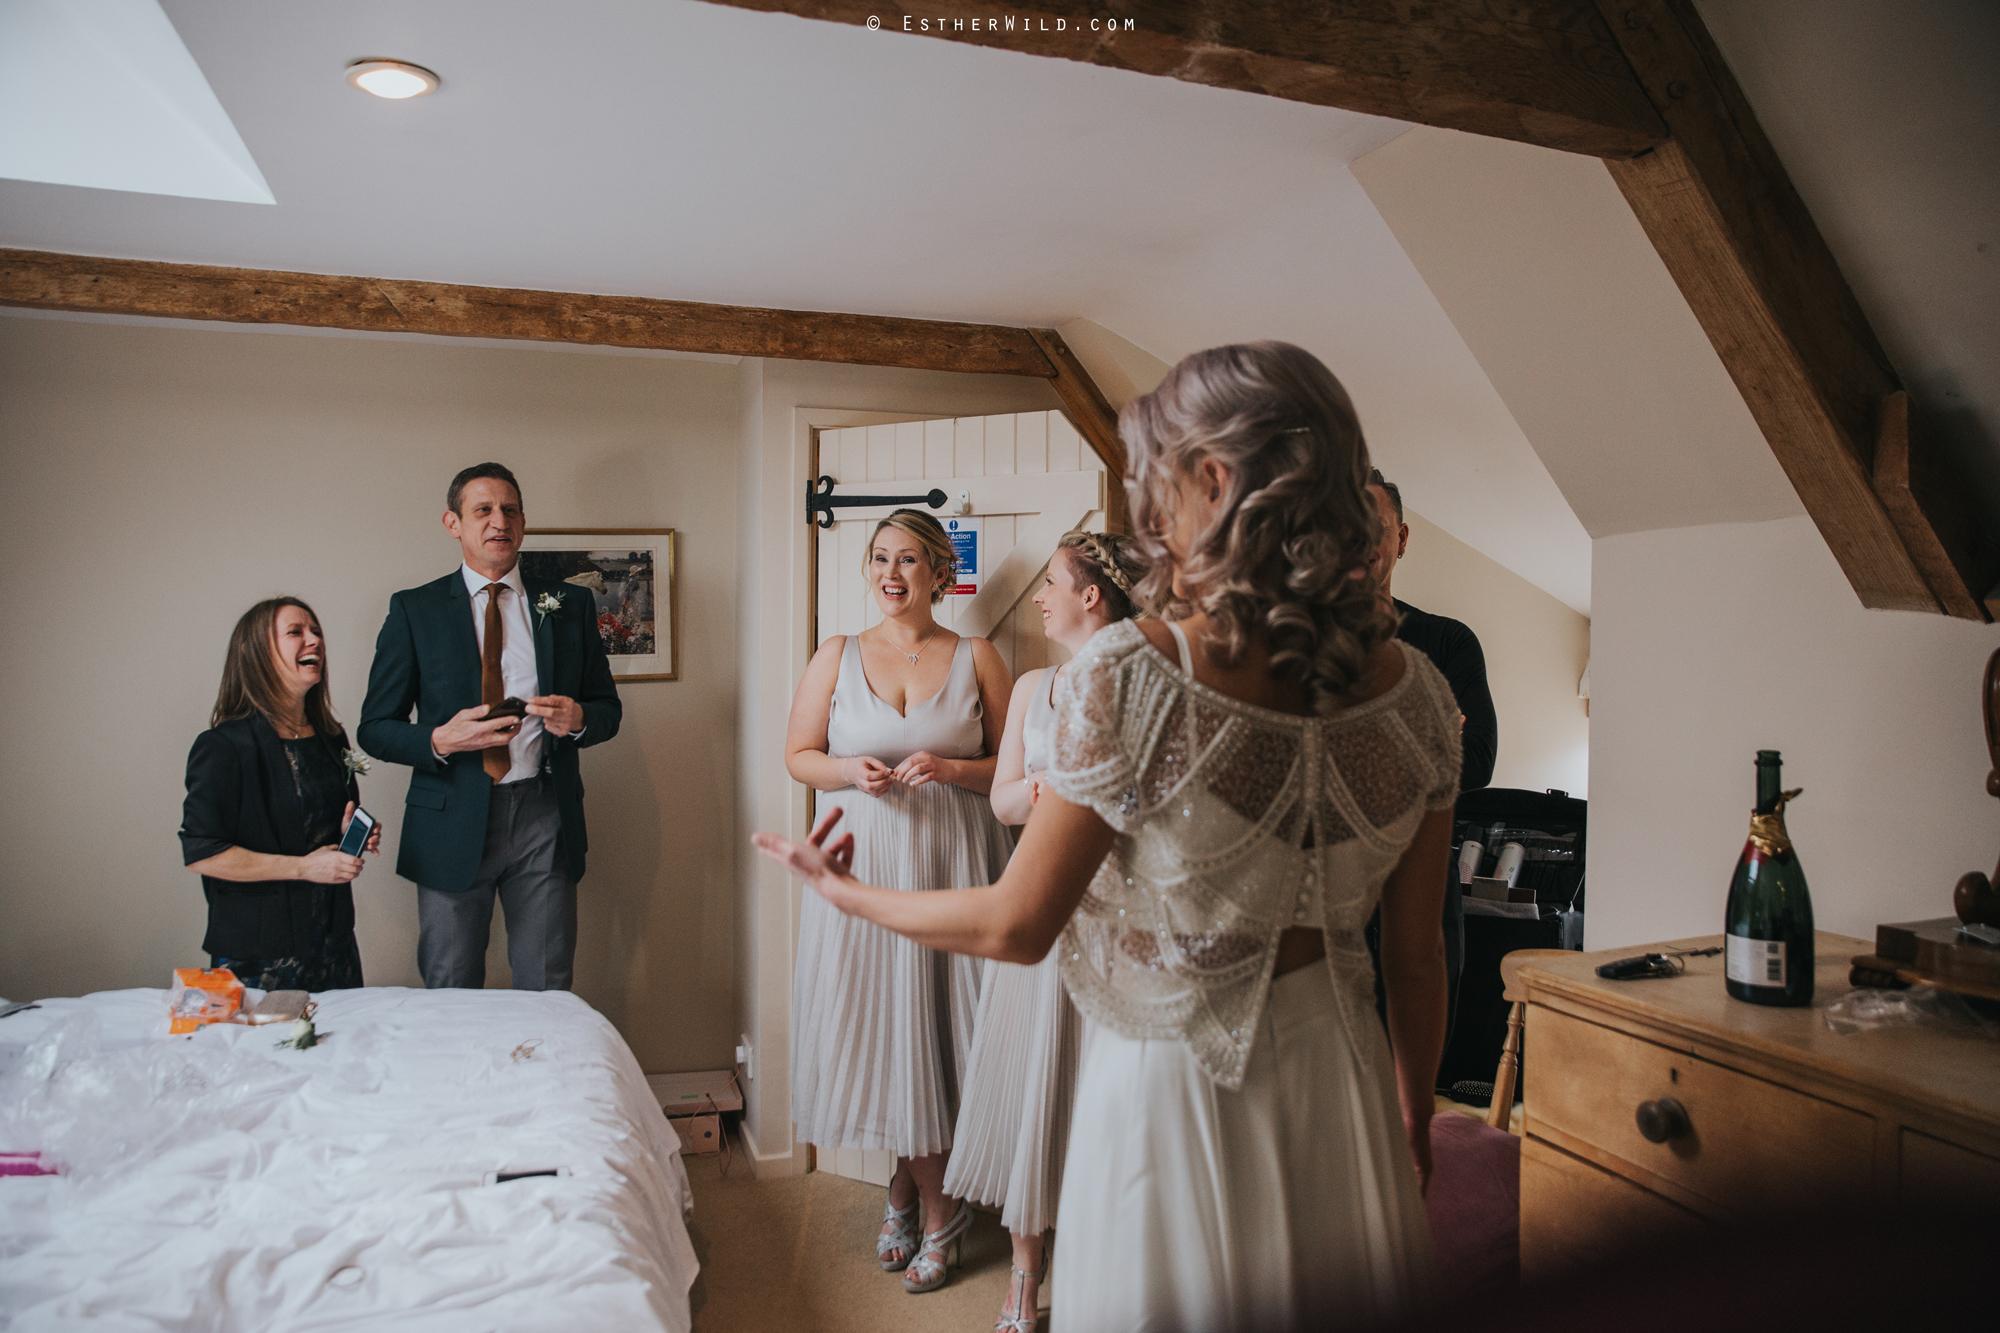 Elms_Barn_Weddings_Suffolk_Photographer_Copyright_Esther_Wild_IMG_0943.jpg